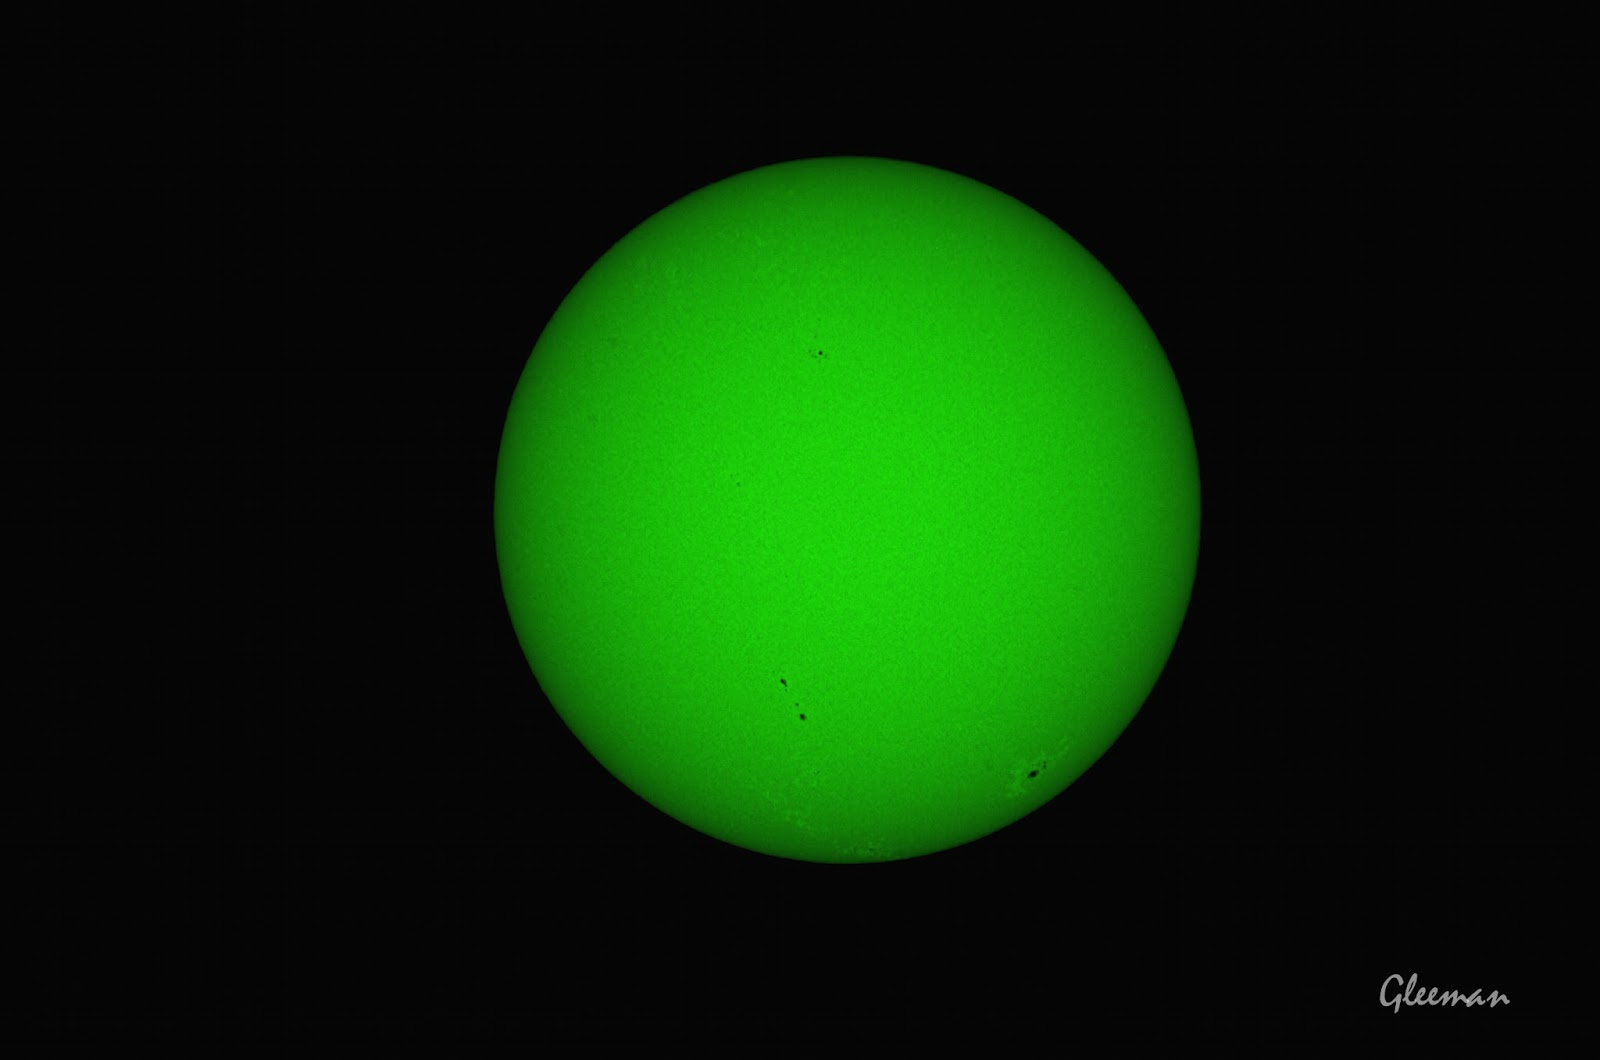 太陽濾紙+ Continuum 540nm 濾鏡。